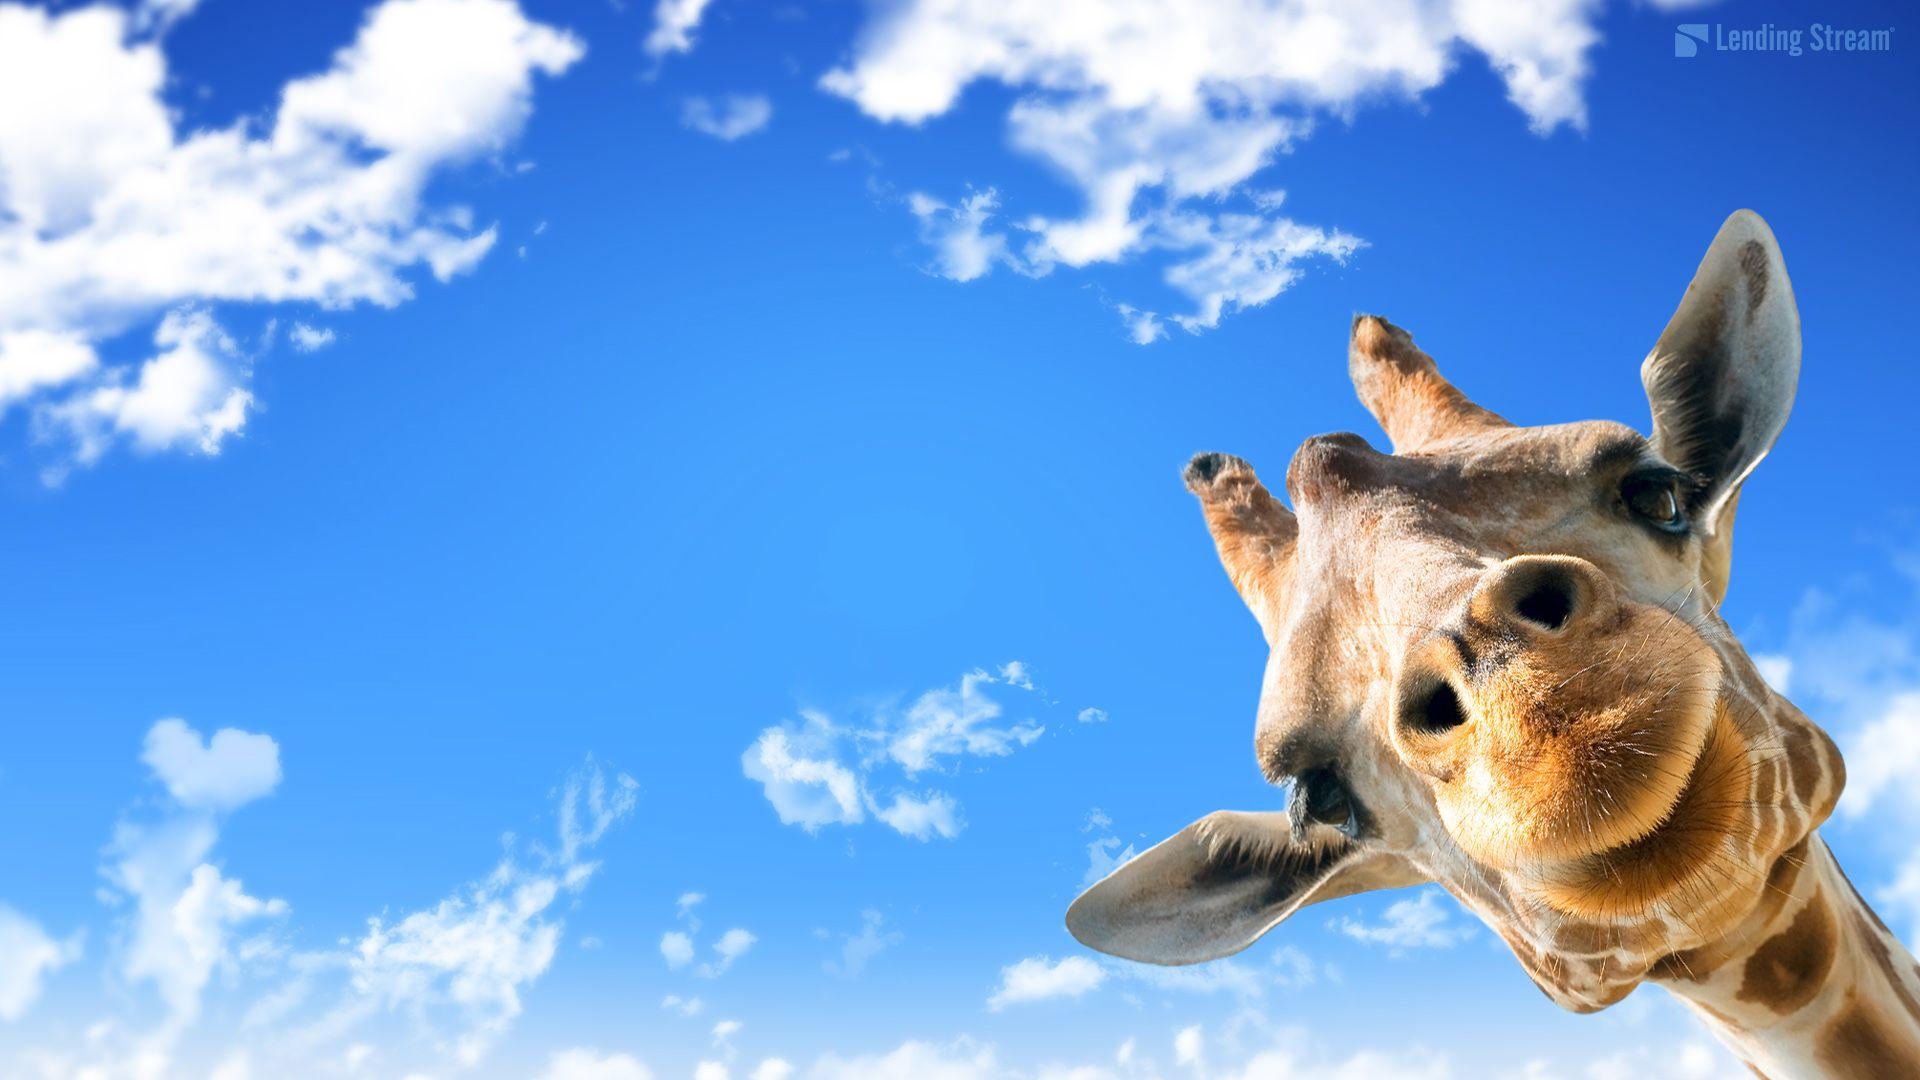 Cute Giraffe #ei1 1920x1080 px 541.75 KB Animal Cute baby ...